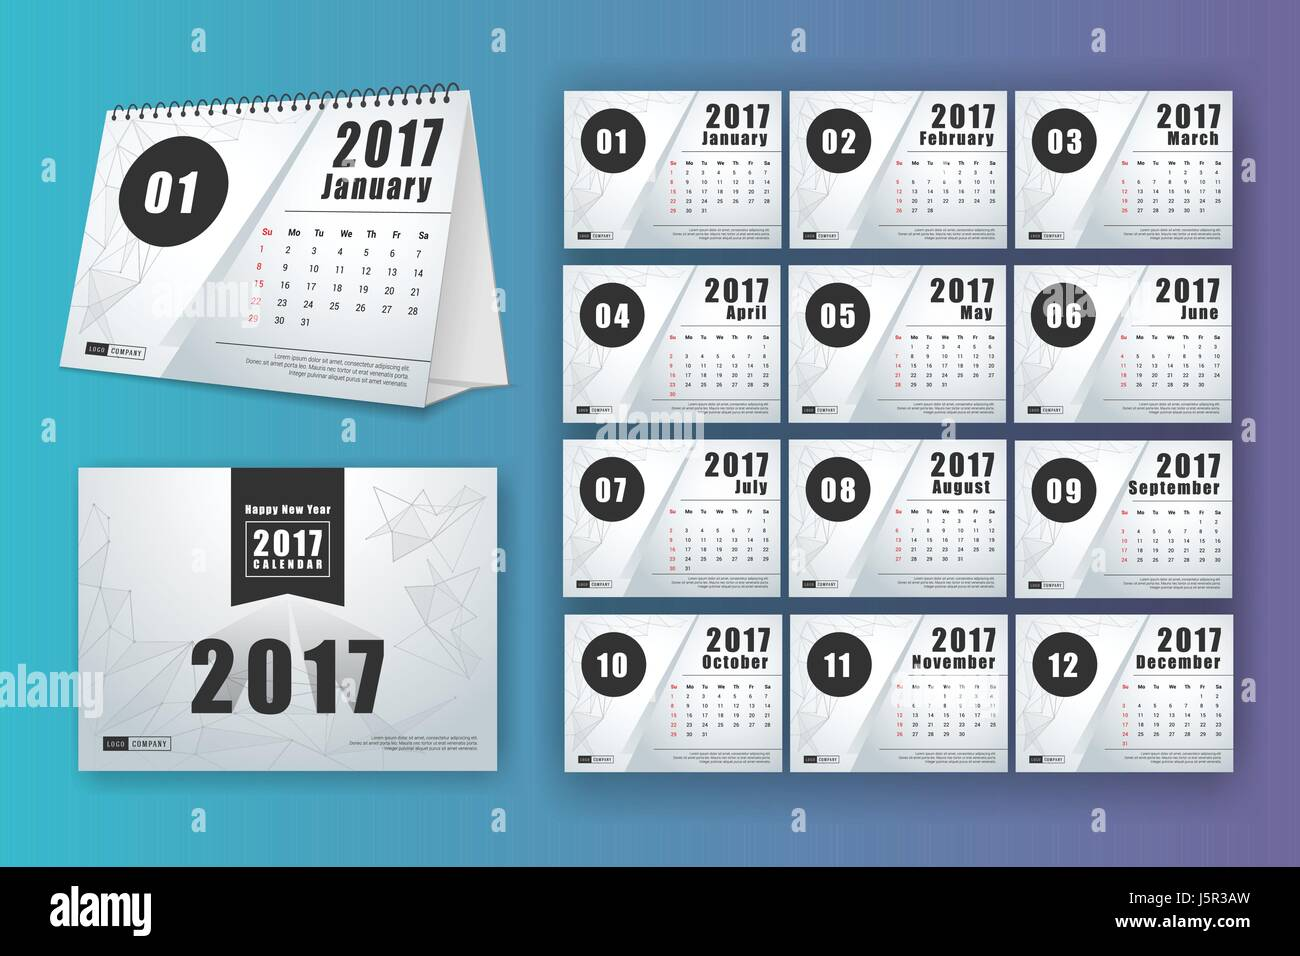 12 month desk calendar template for print design with mesh polygon 12 month desk calendar template for print design with mesh polygon background 2017 calendar design start with sunday 7x5 inches size with bleeds vec saigontimesfo